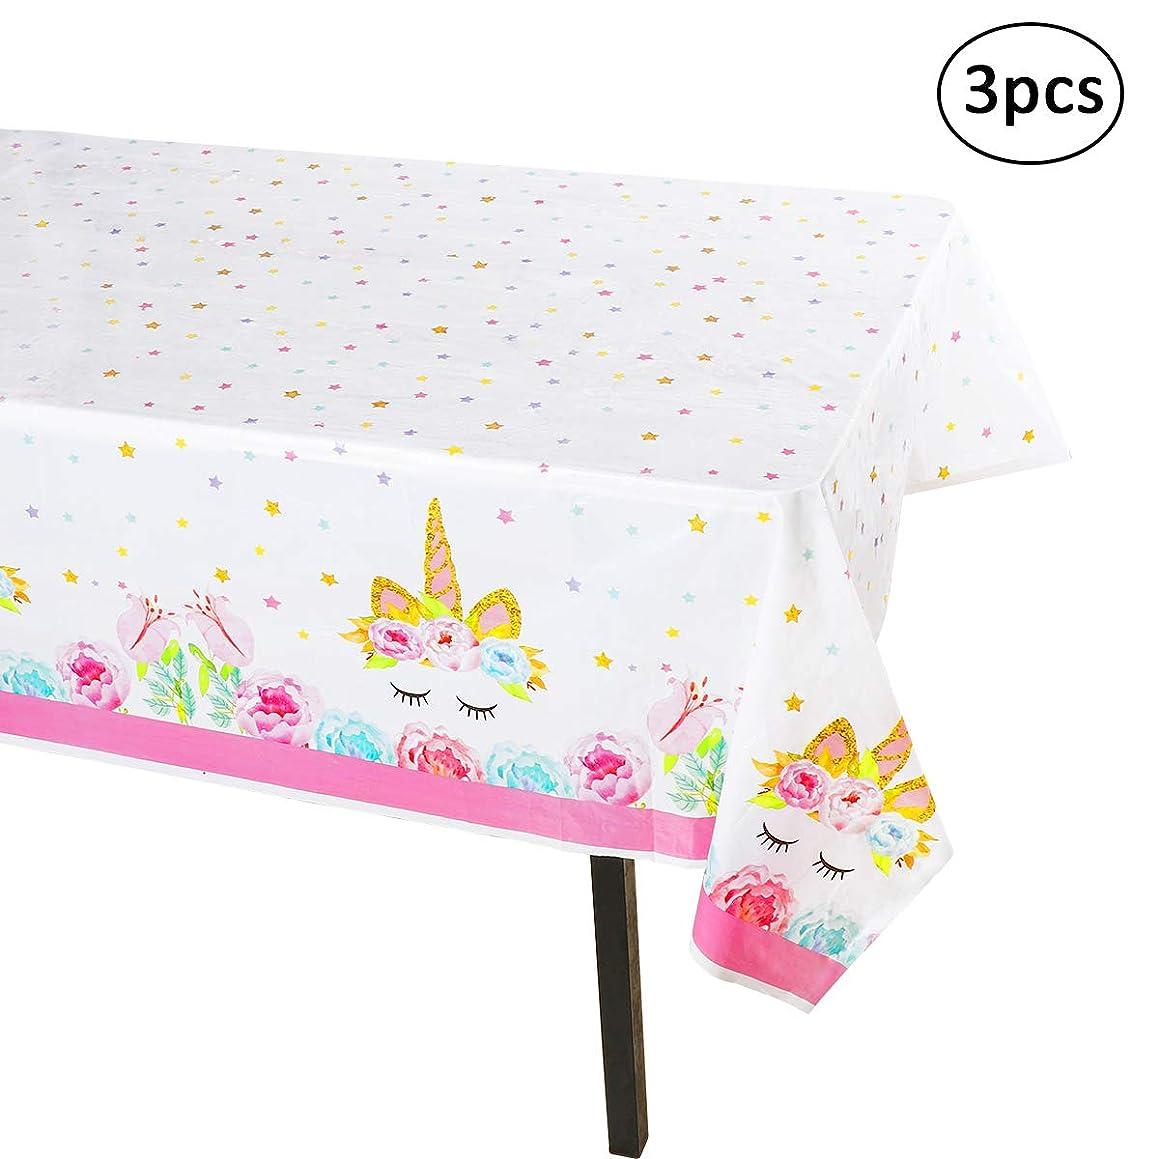 Unicorn Tablecloth - 3 Pack - Large Size(54